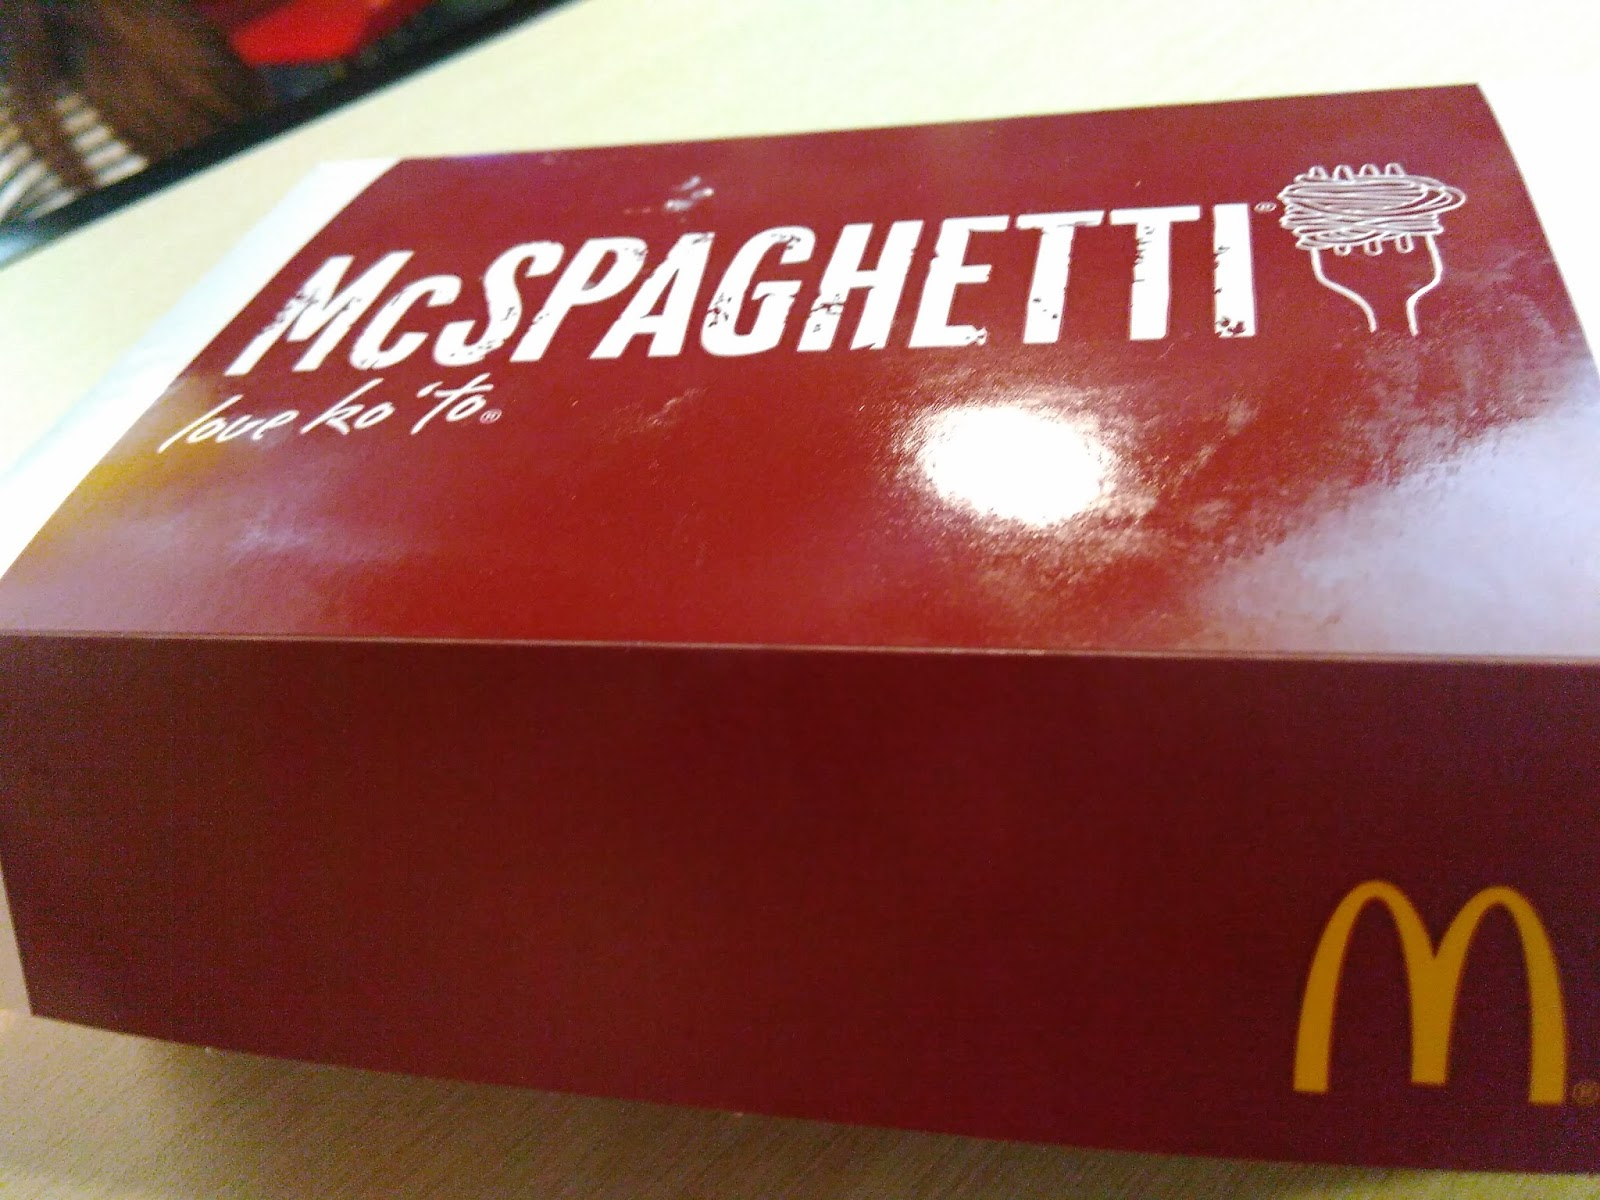 mcspaghetti applestory.biz